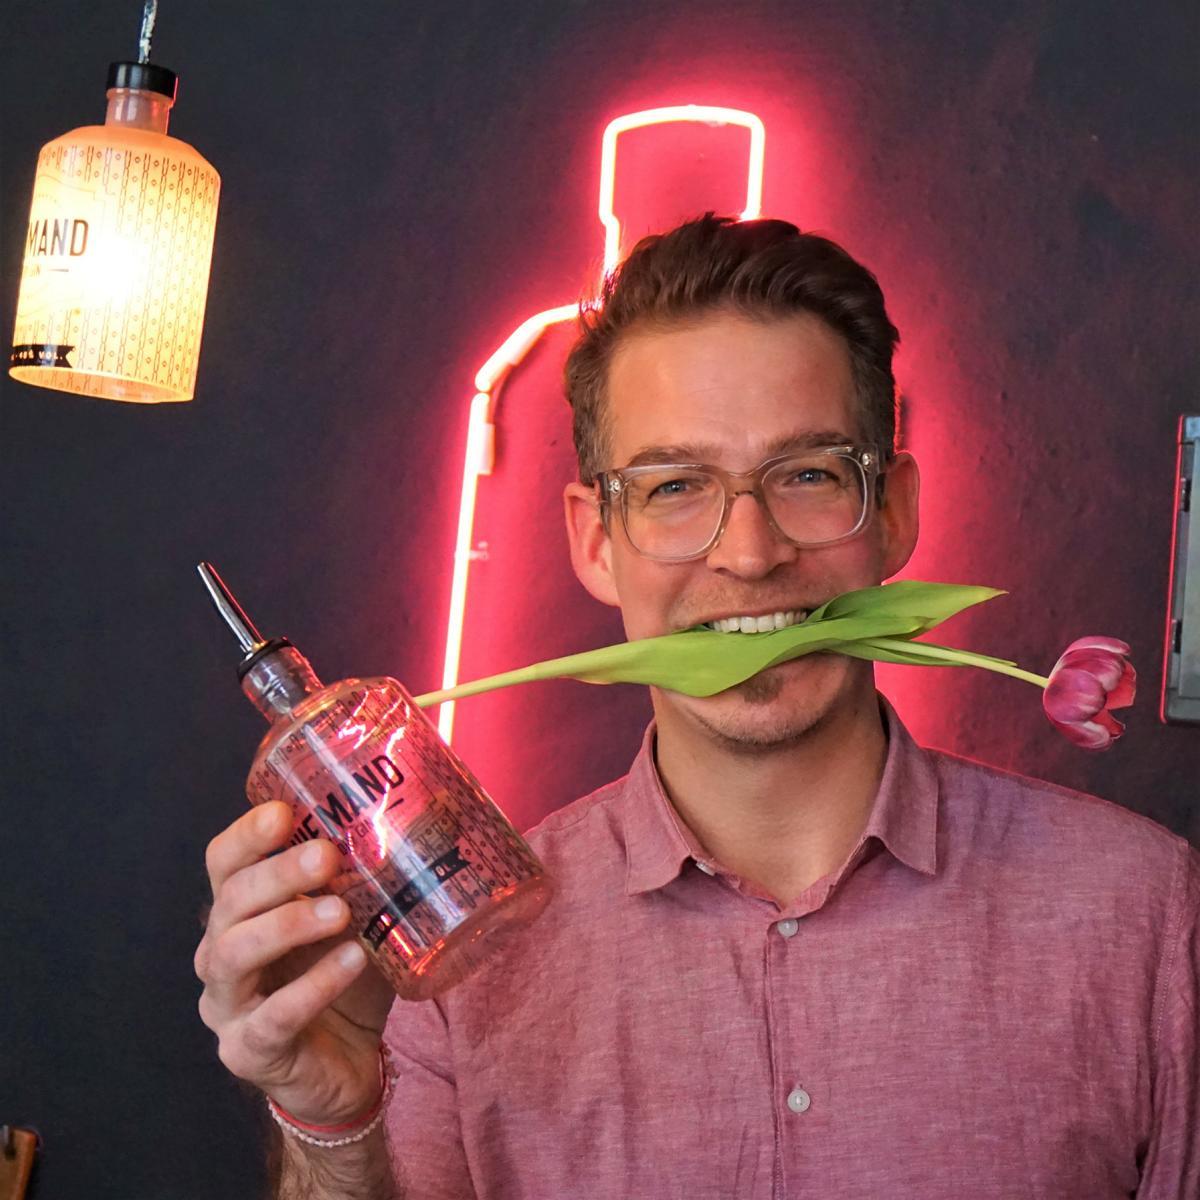 Style Hannover Niemand Gin Torben Paradiek - Stadtteil-test